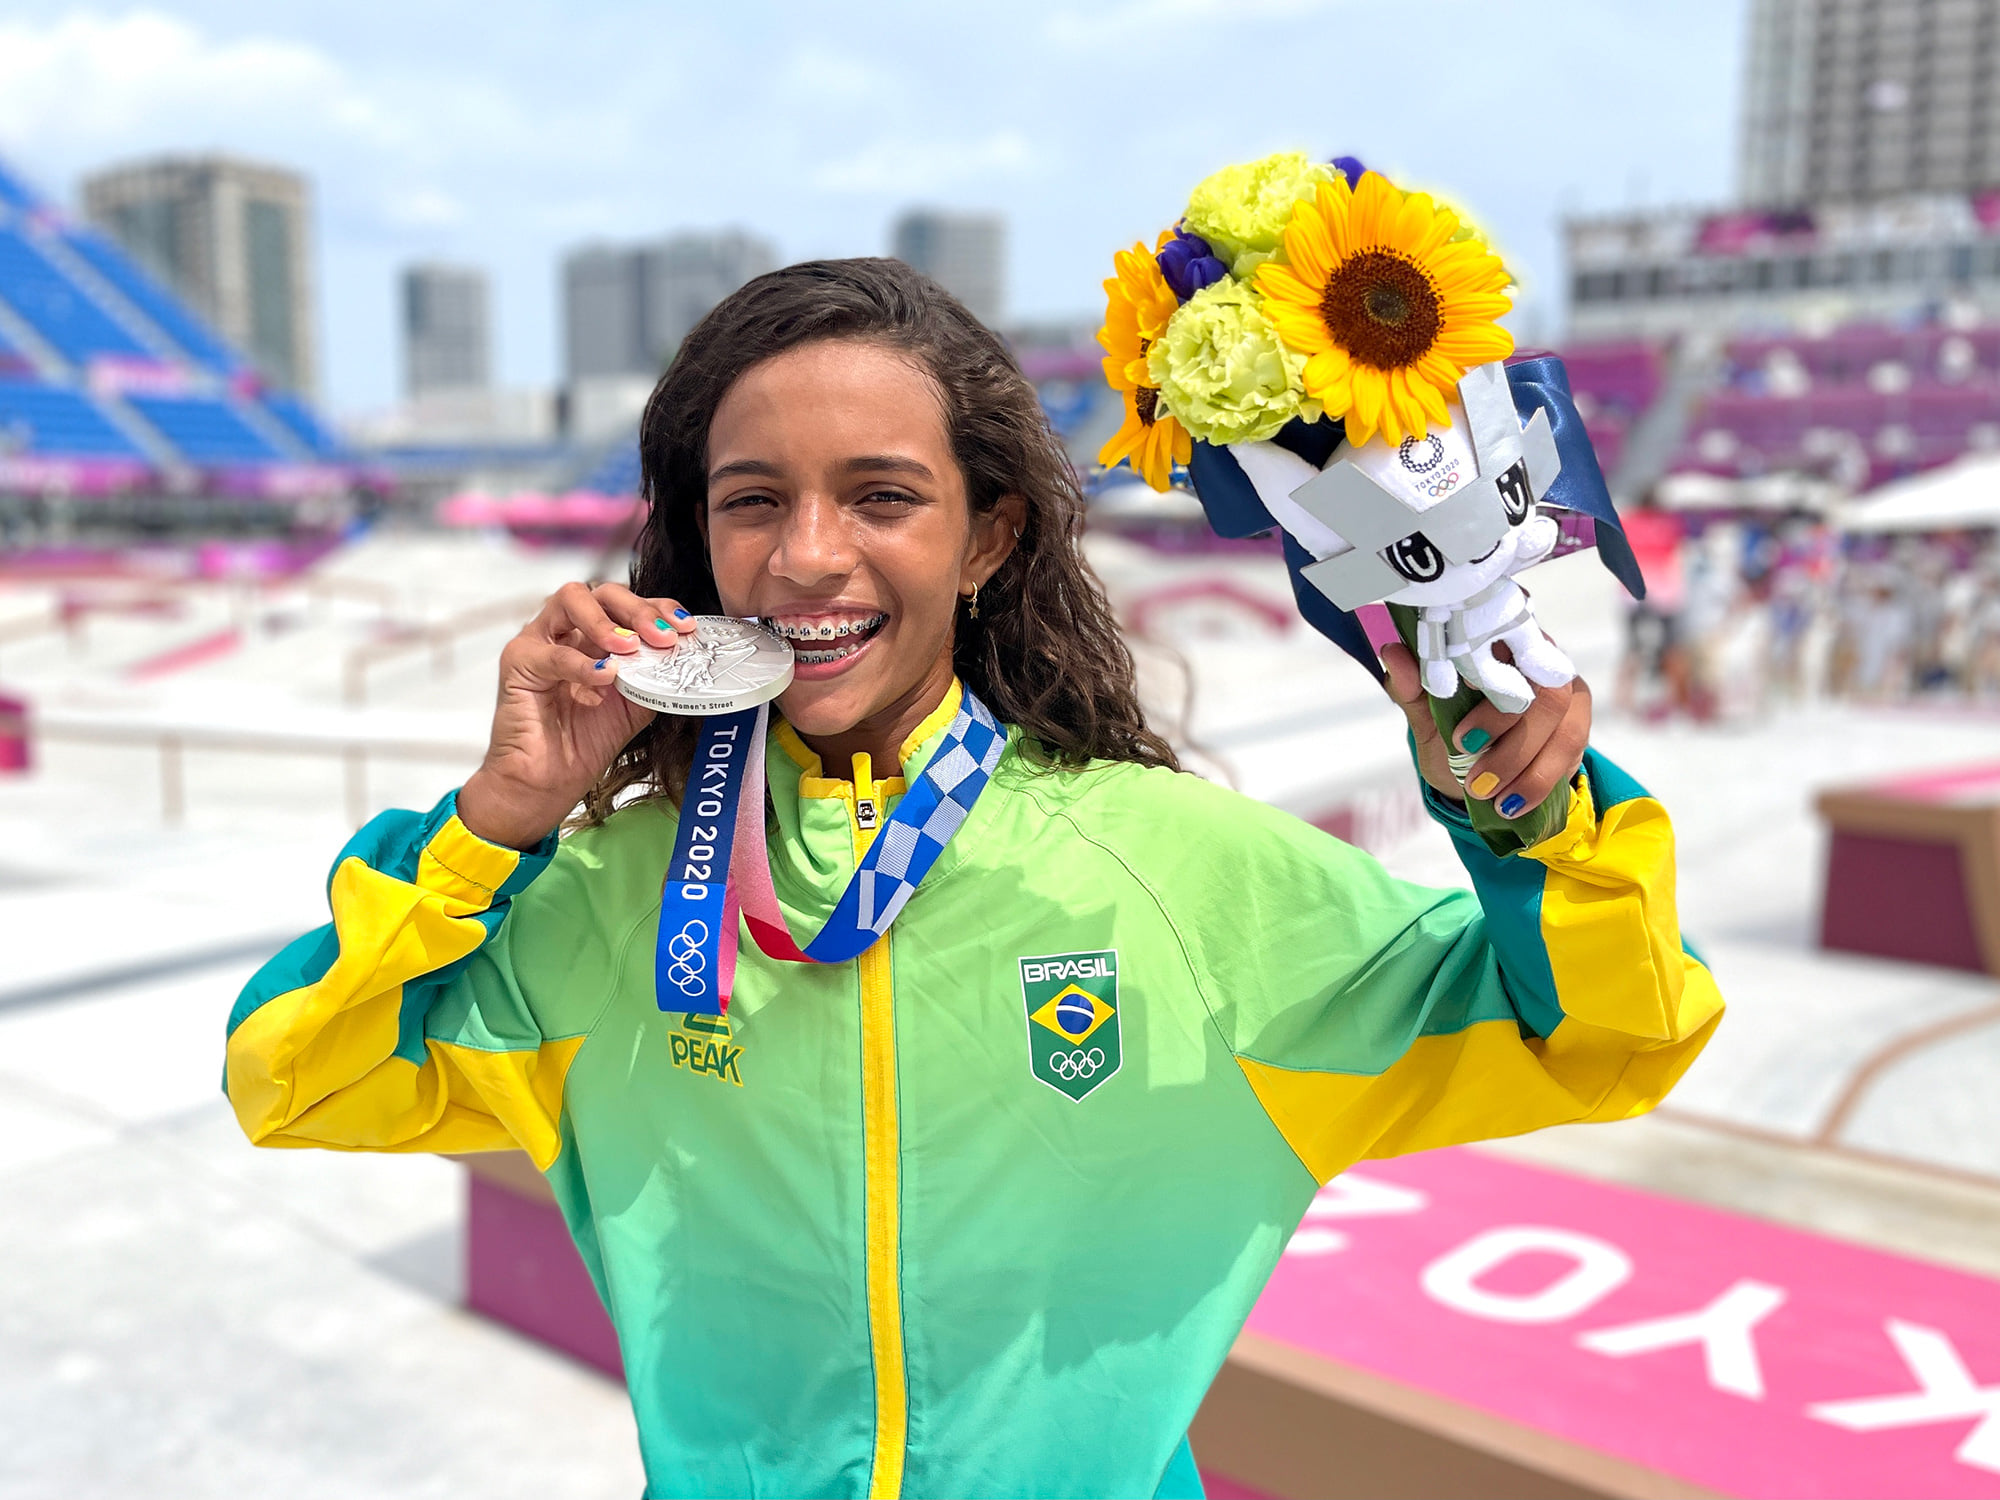 Elas podem sim!!!! Brasil · Jogos Olímpicos Tóquio 2020